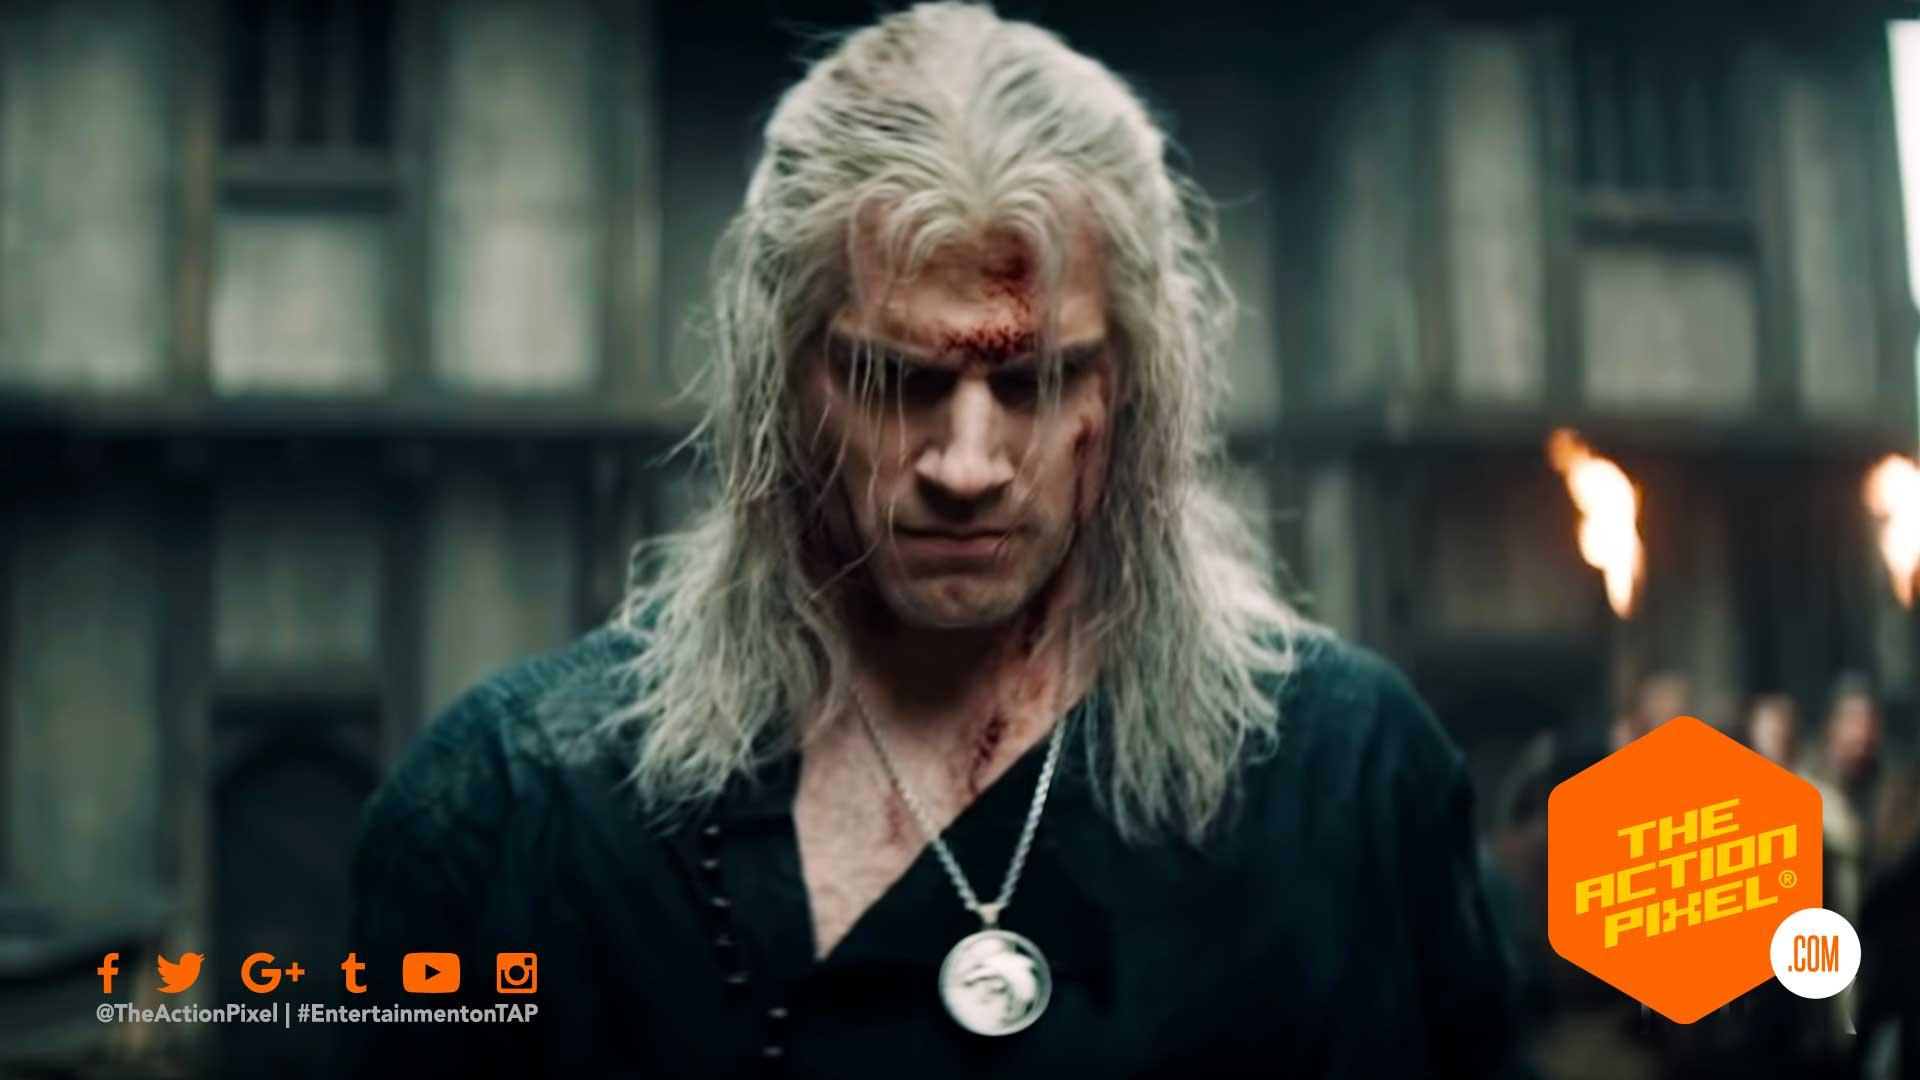 the witcher 3: wild hunt, Geralt, netflix, entertainment on tap, the action pixel, @theactionpixel, the witcher,yennefer,Anya Chalotra, Freya Allan, ciri, geralt, henry cavill, netflix, featured,teaser trailer,